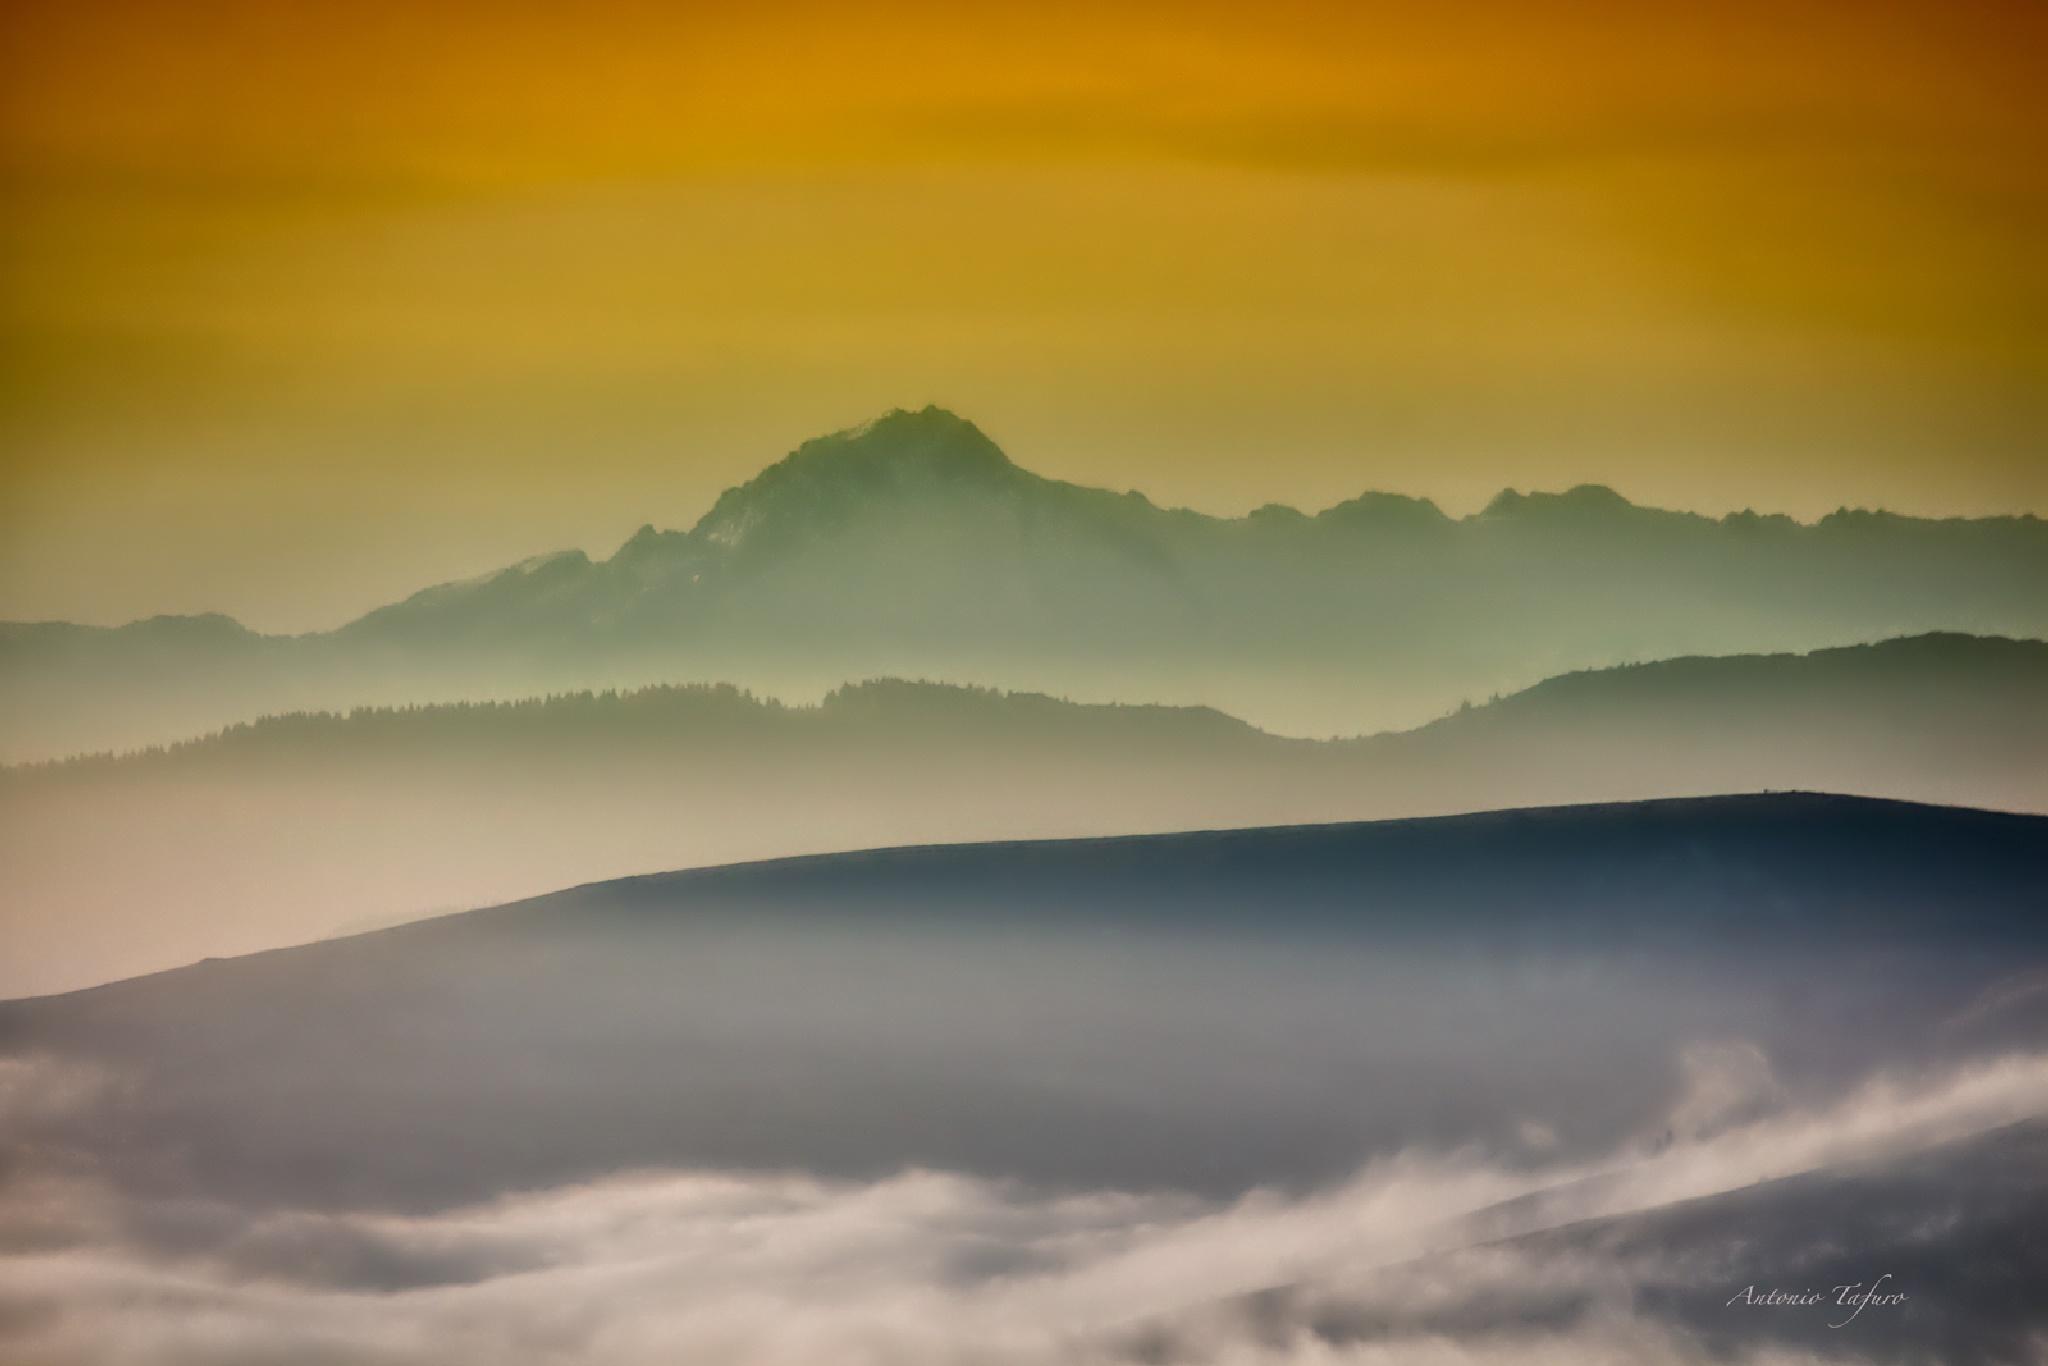 Mountain sunset by Antonio Tafuro